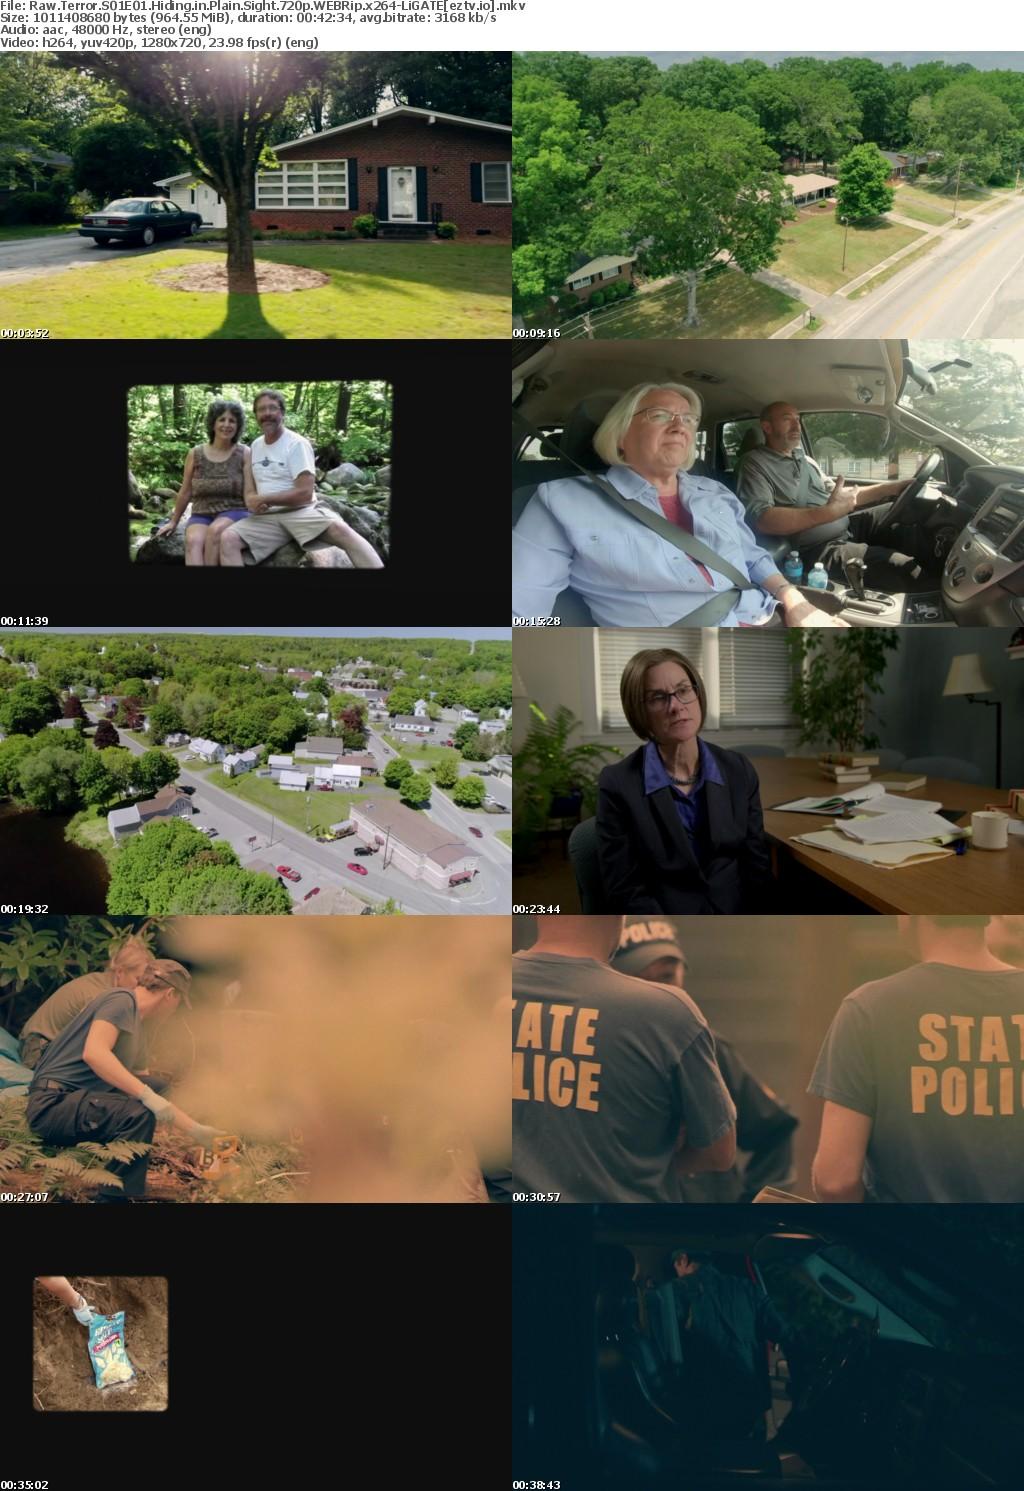 Raw Terror S01E01 Hiding in Plain Sight 720p WEBRip x264-LiGATE